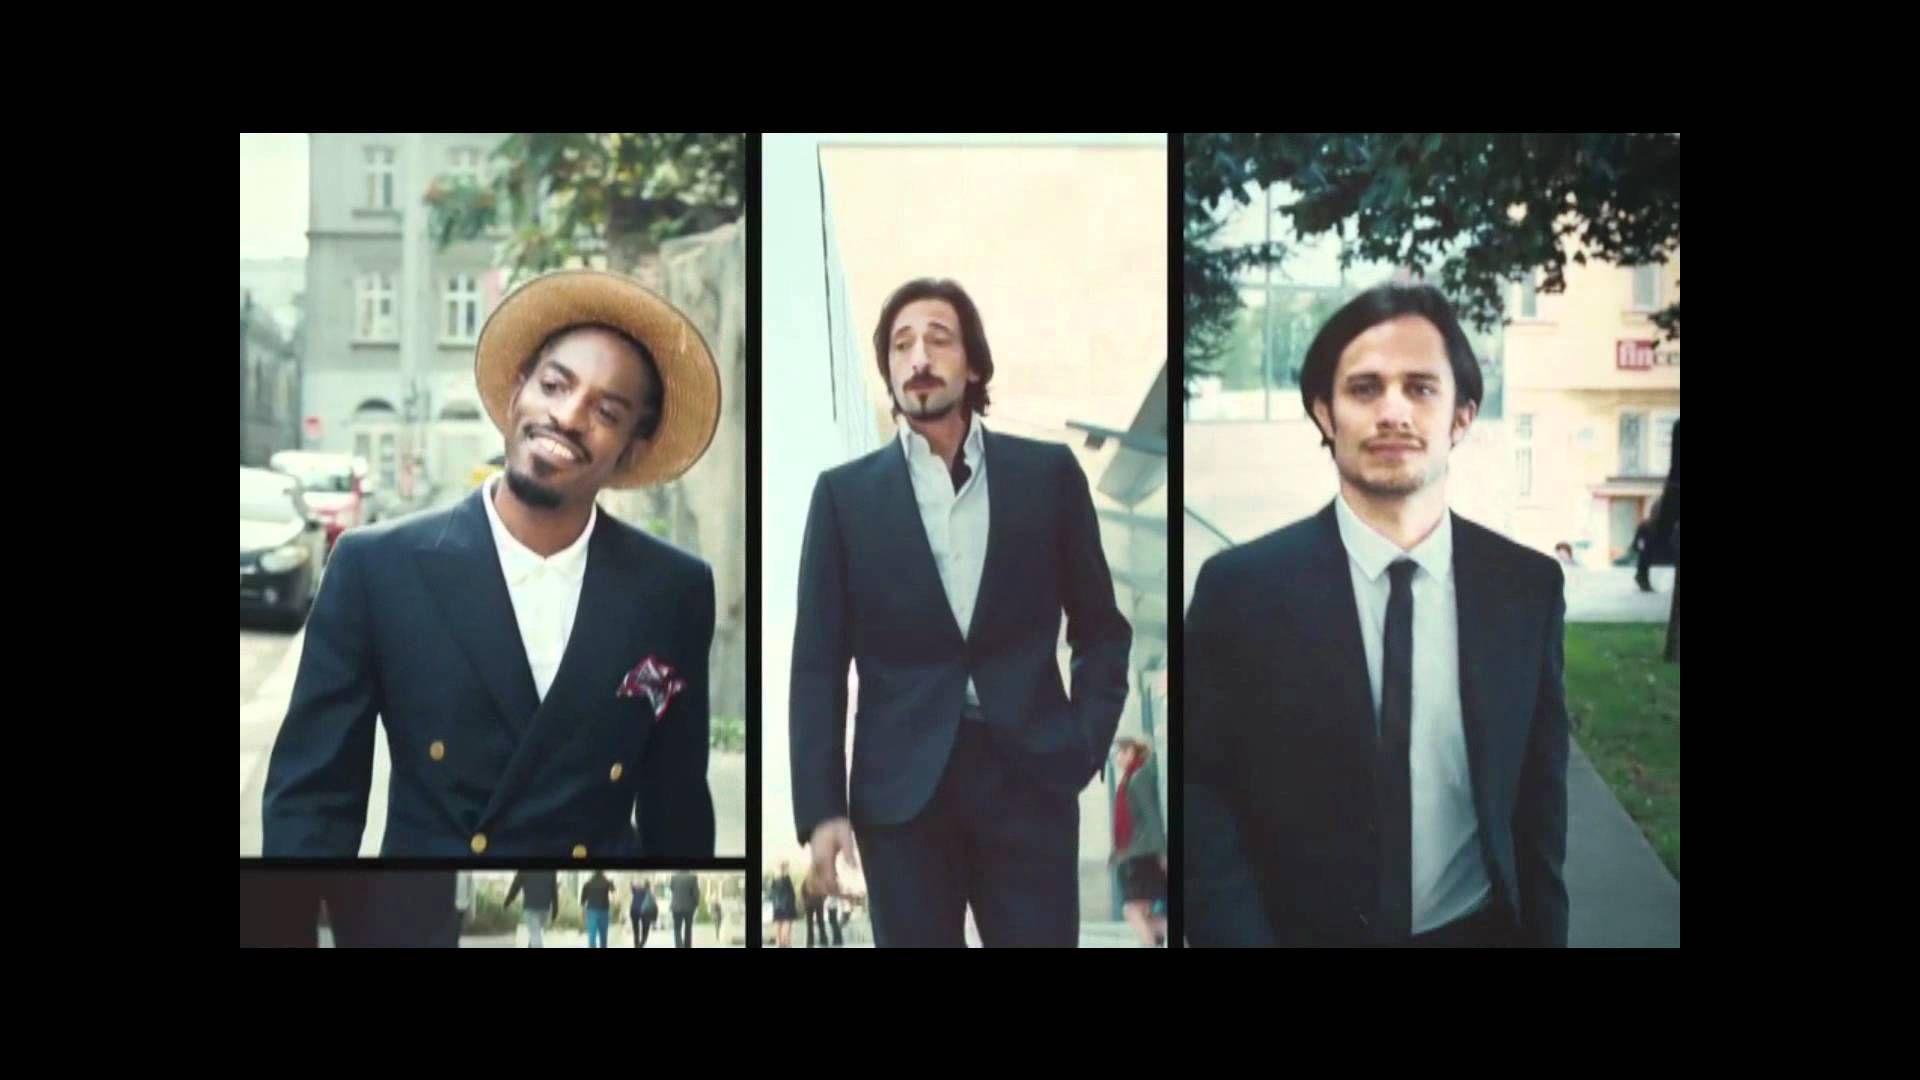 Gillette commercial starring Adrien Brody, Gael García Bernal